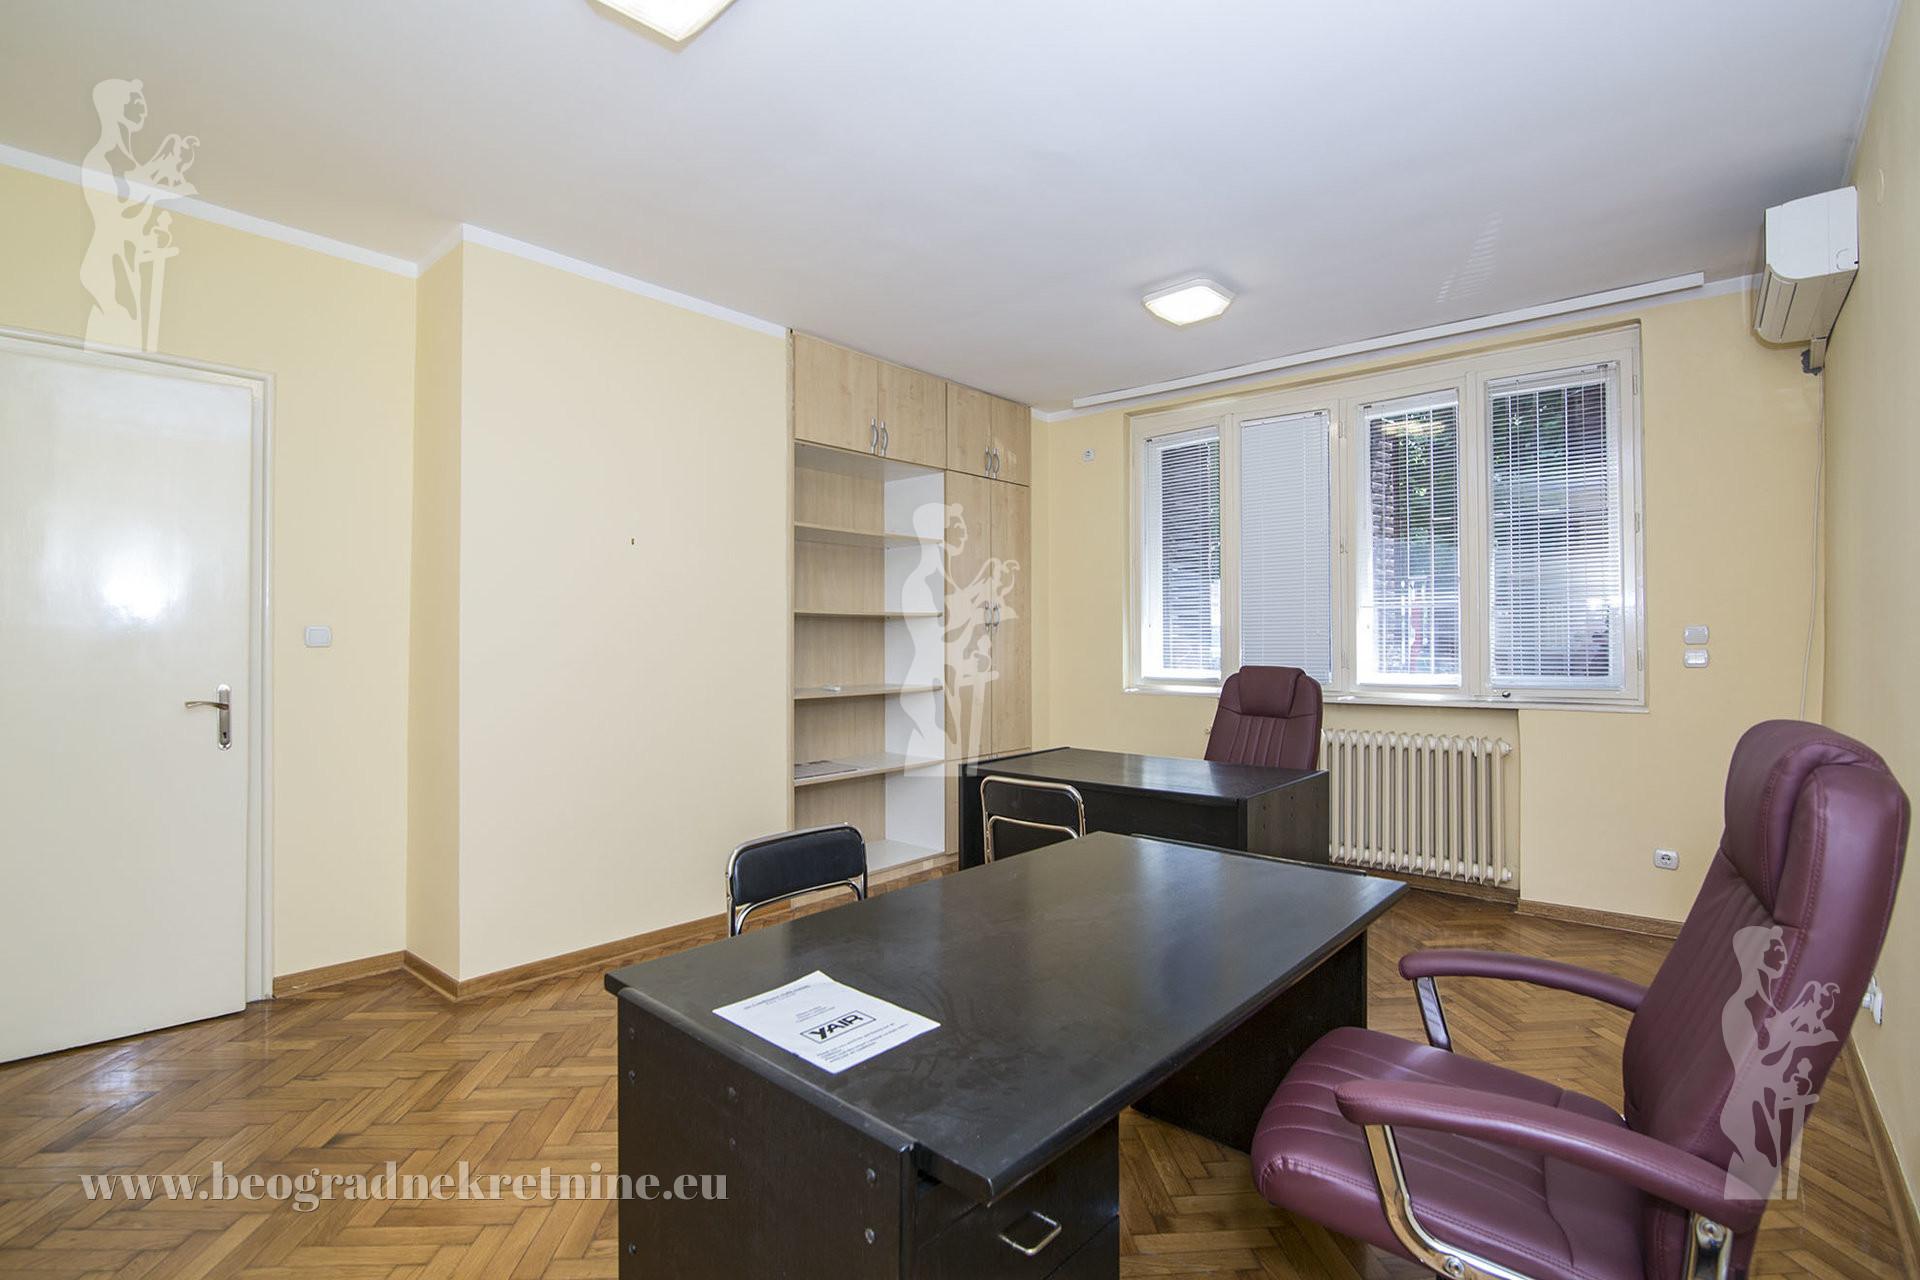 Poslovni prostor Politika 57 m2